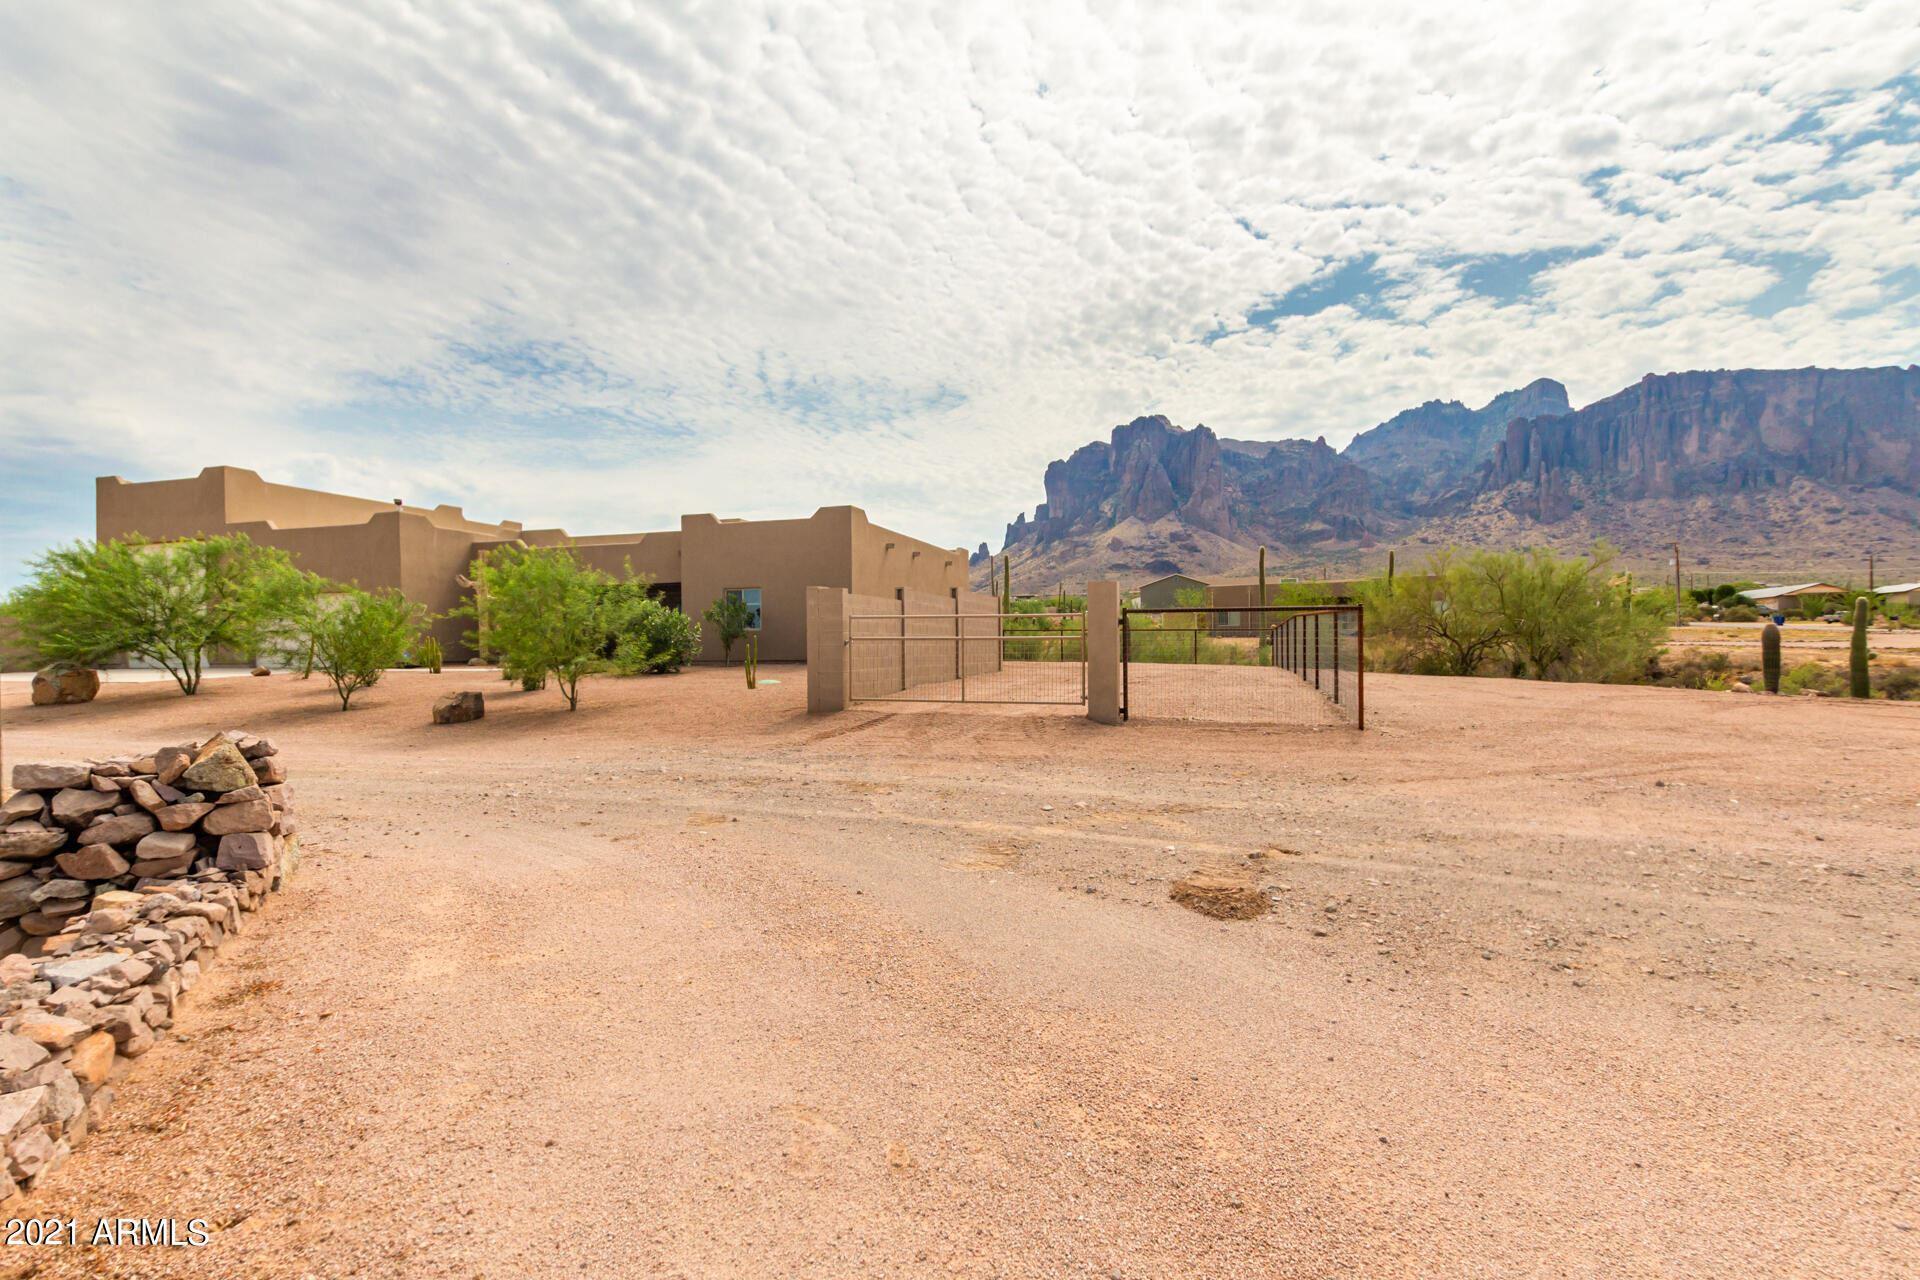 Photo of 3487 N SIXSHOOTER Road, Apache Junction, AZ 85119 (MLS # 6265883)